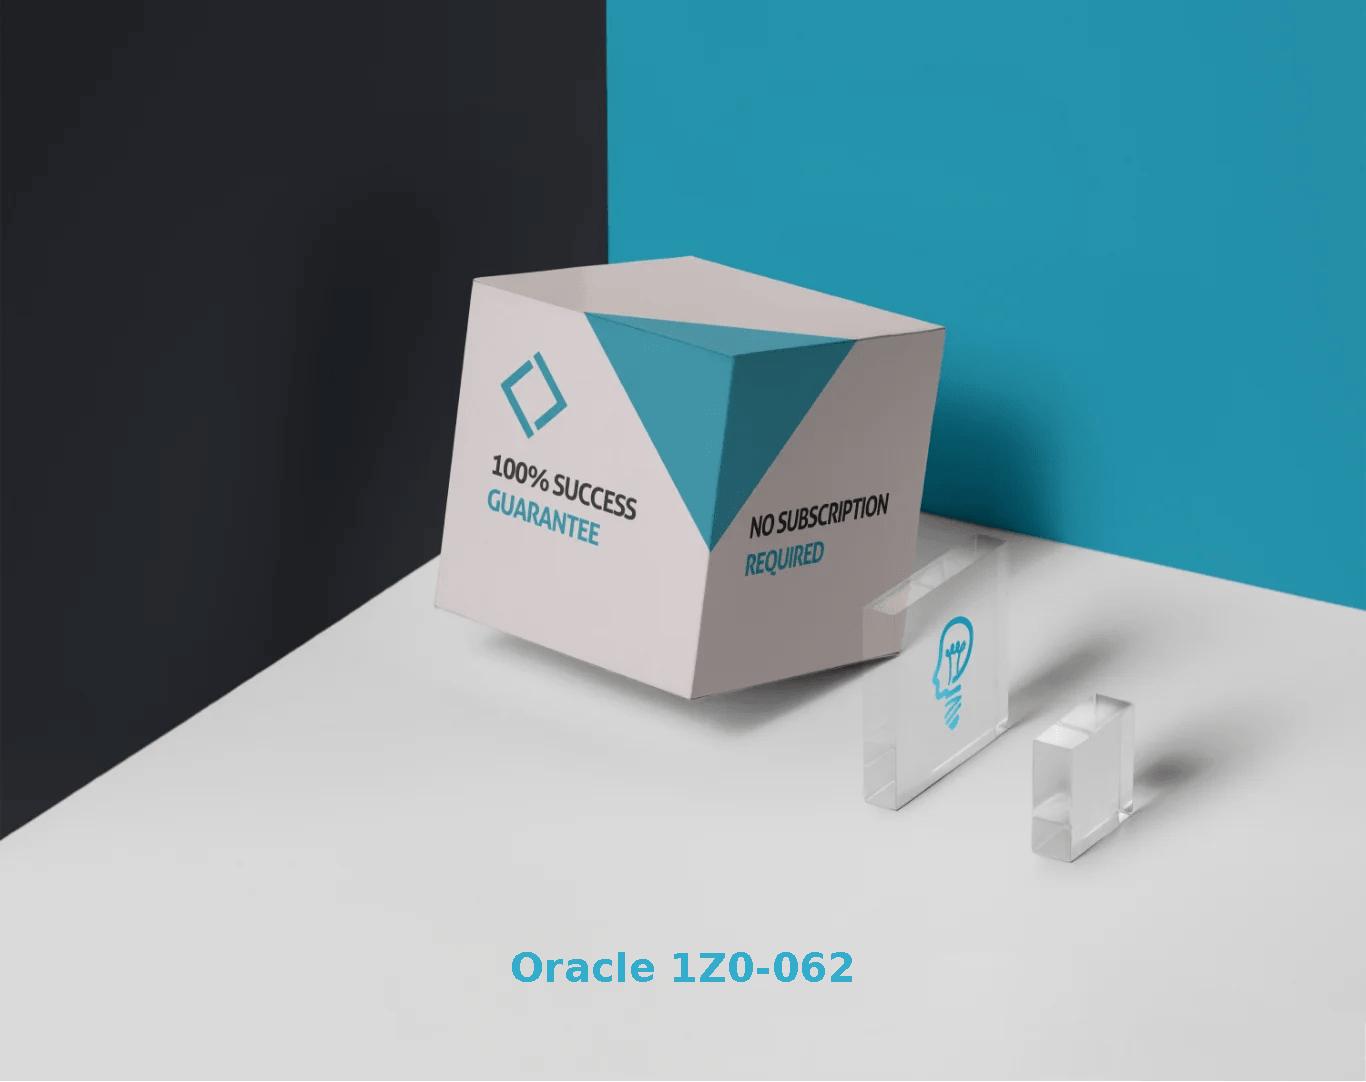 Oracle 1Z0-062 Exams